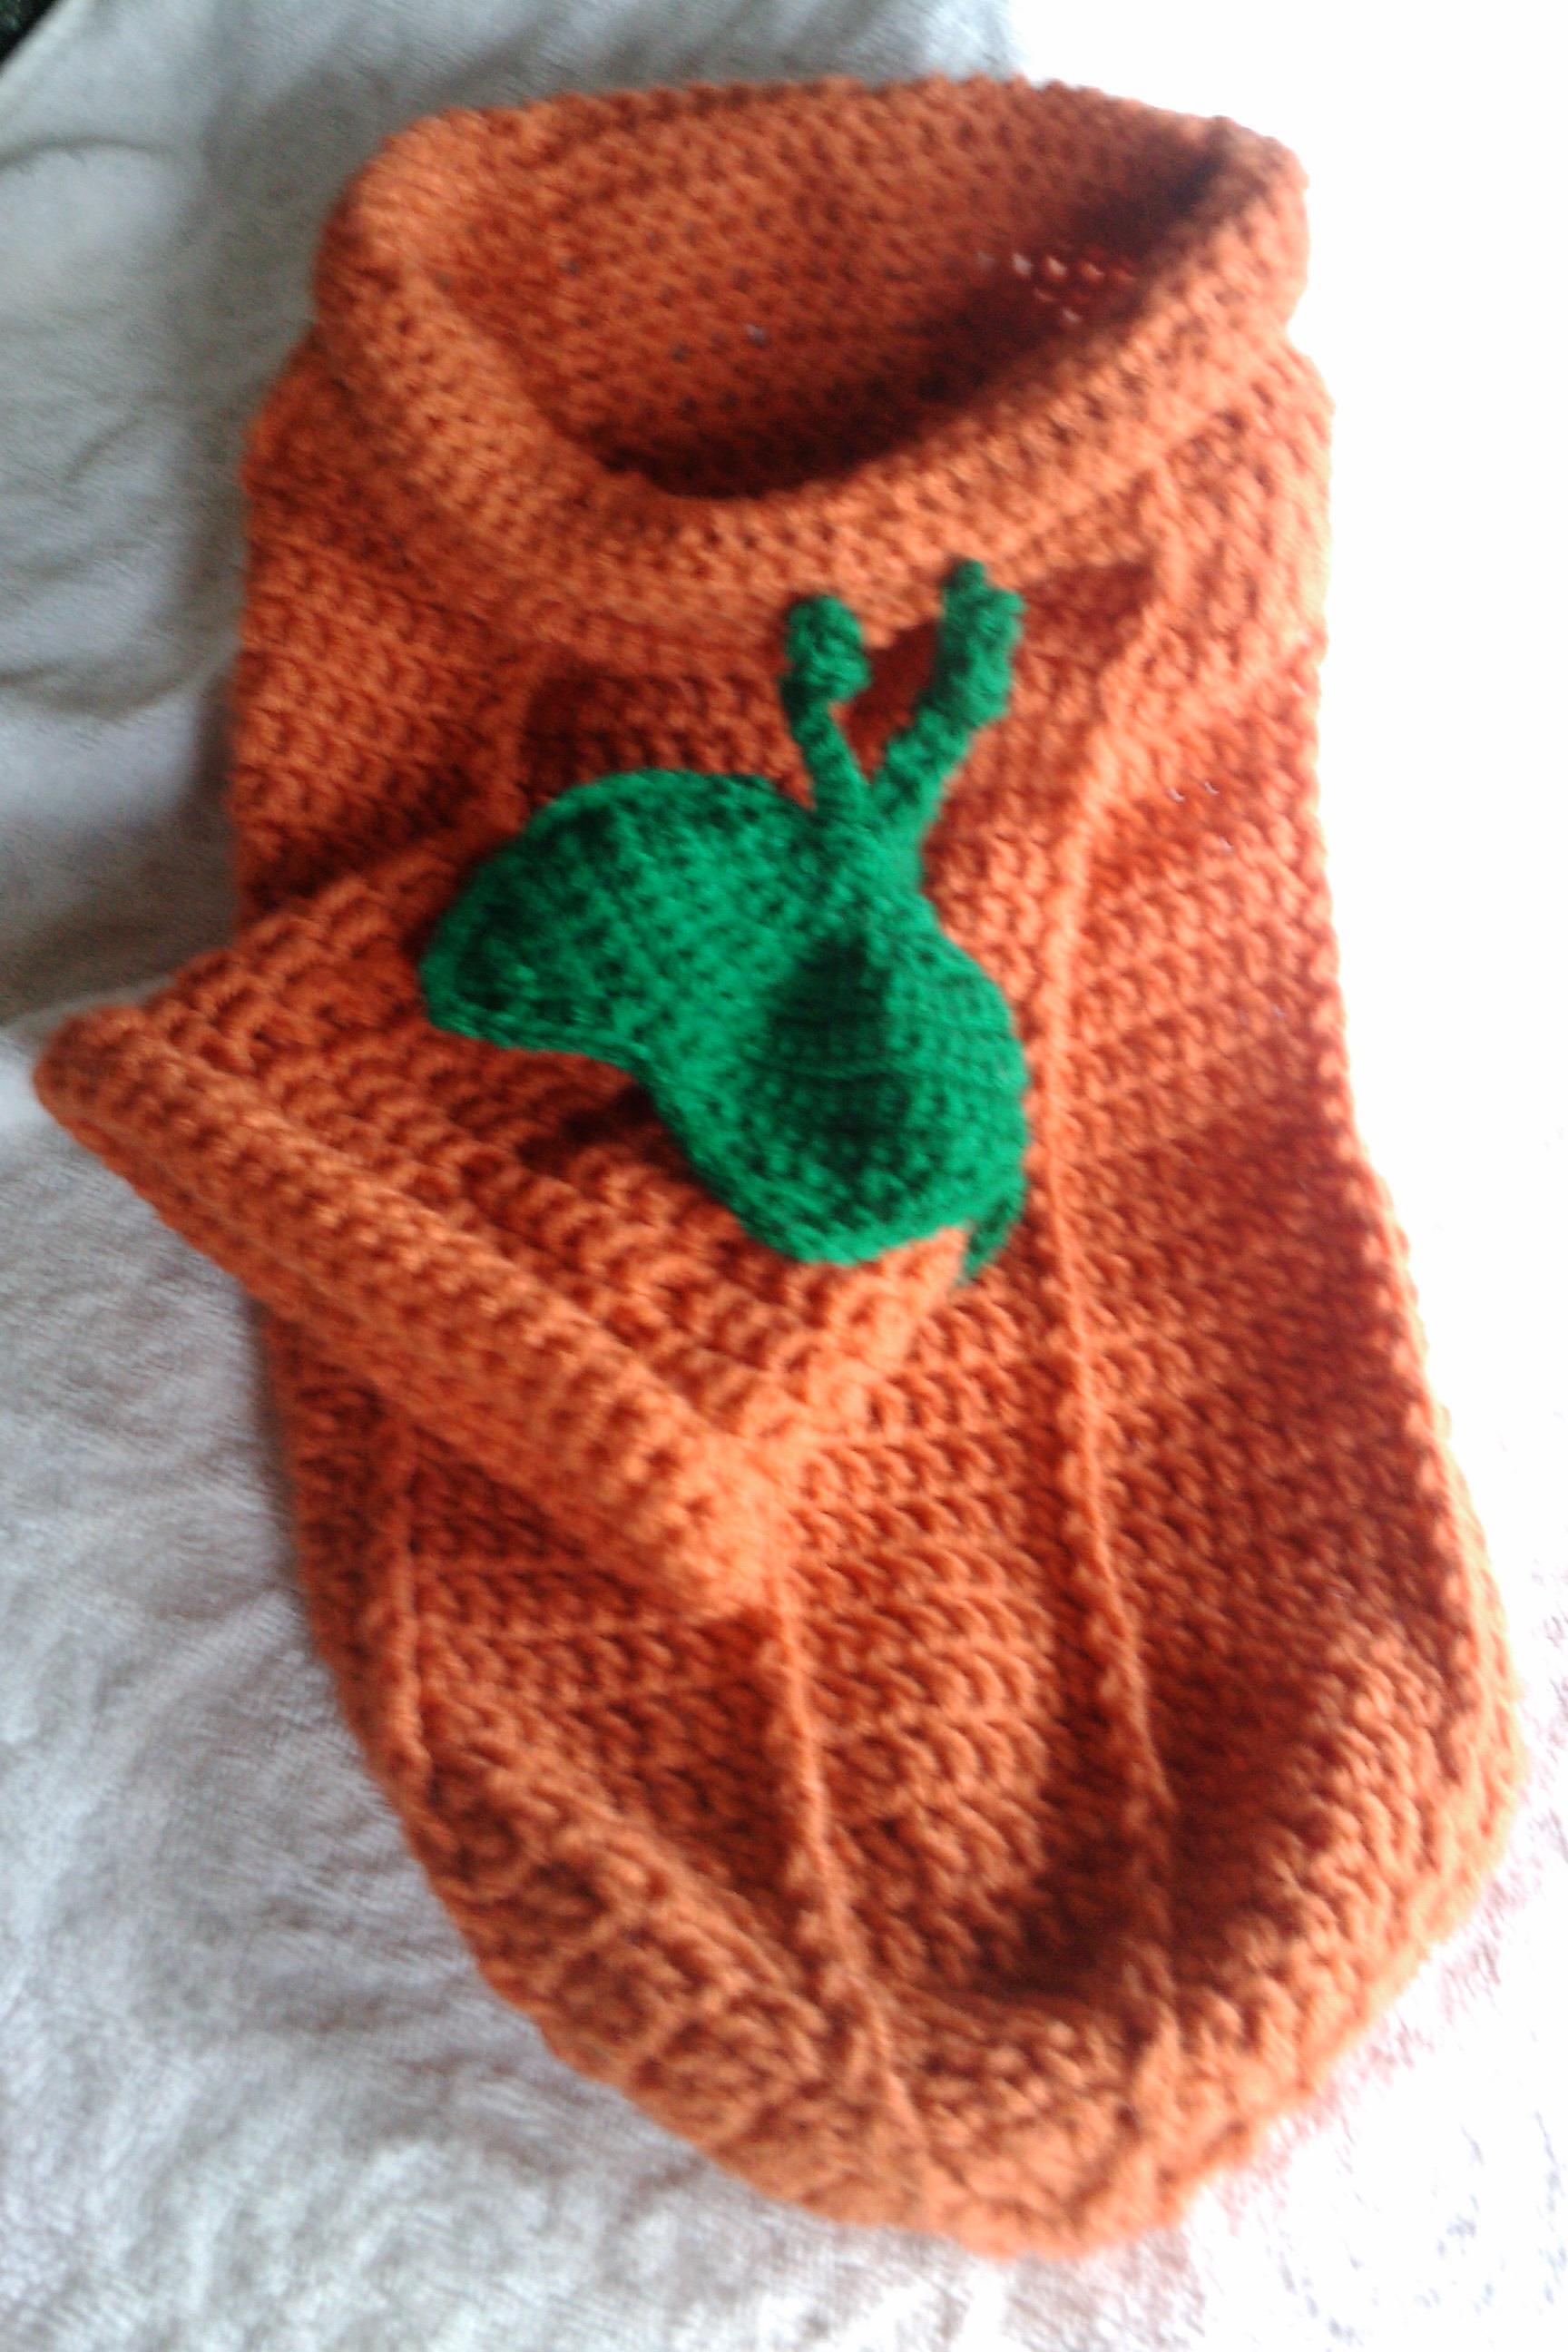 Free Crochet Pattern For Pumpkin Baby Cocoon With Hat : Thanksgiving Pumpkin Hat & Baby Cocoon West Coast Fibre ...